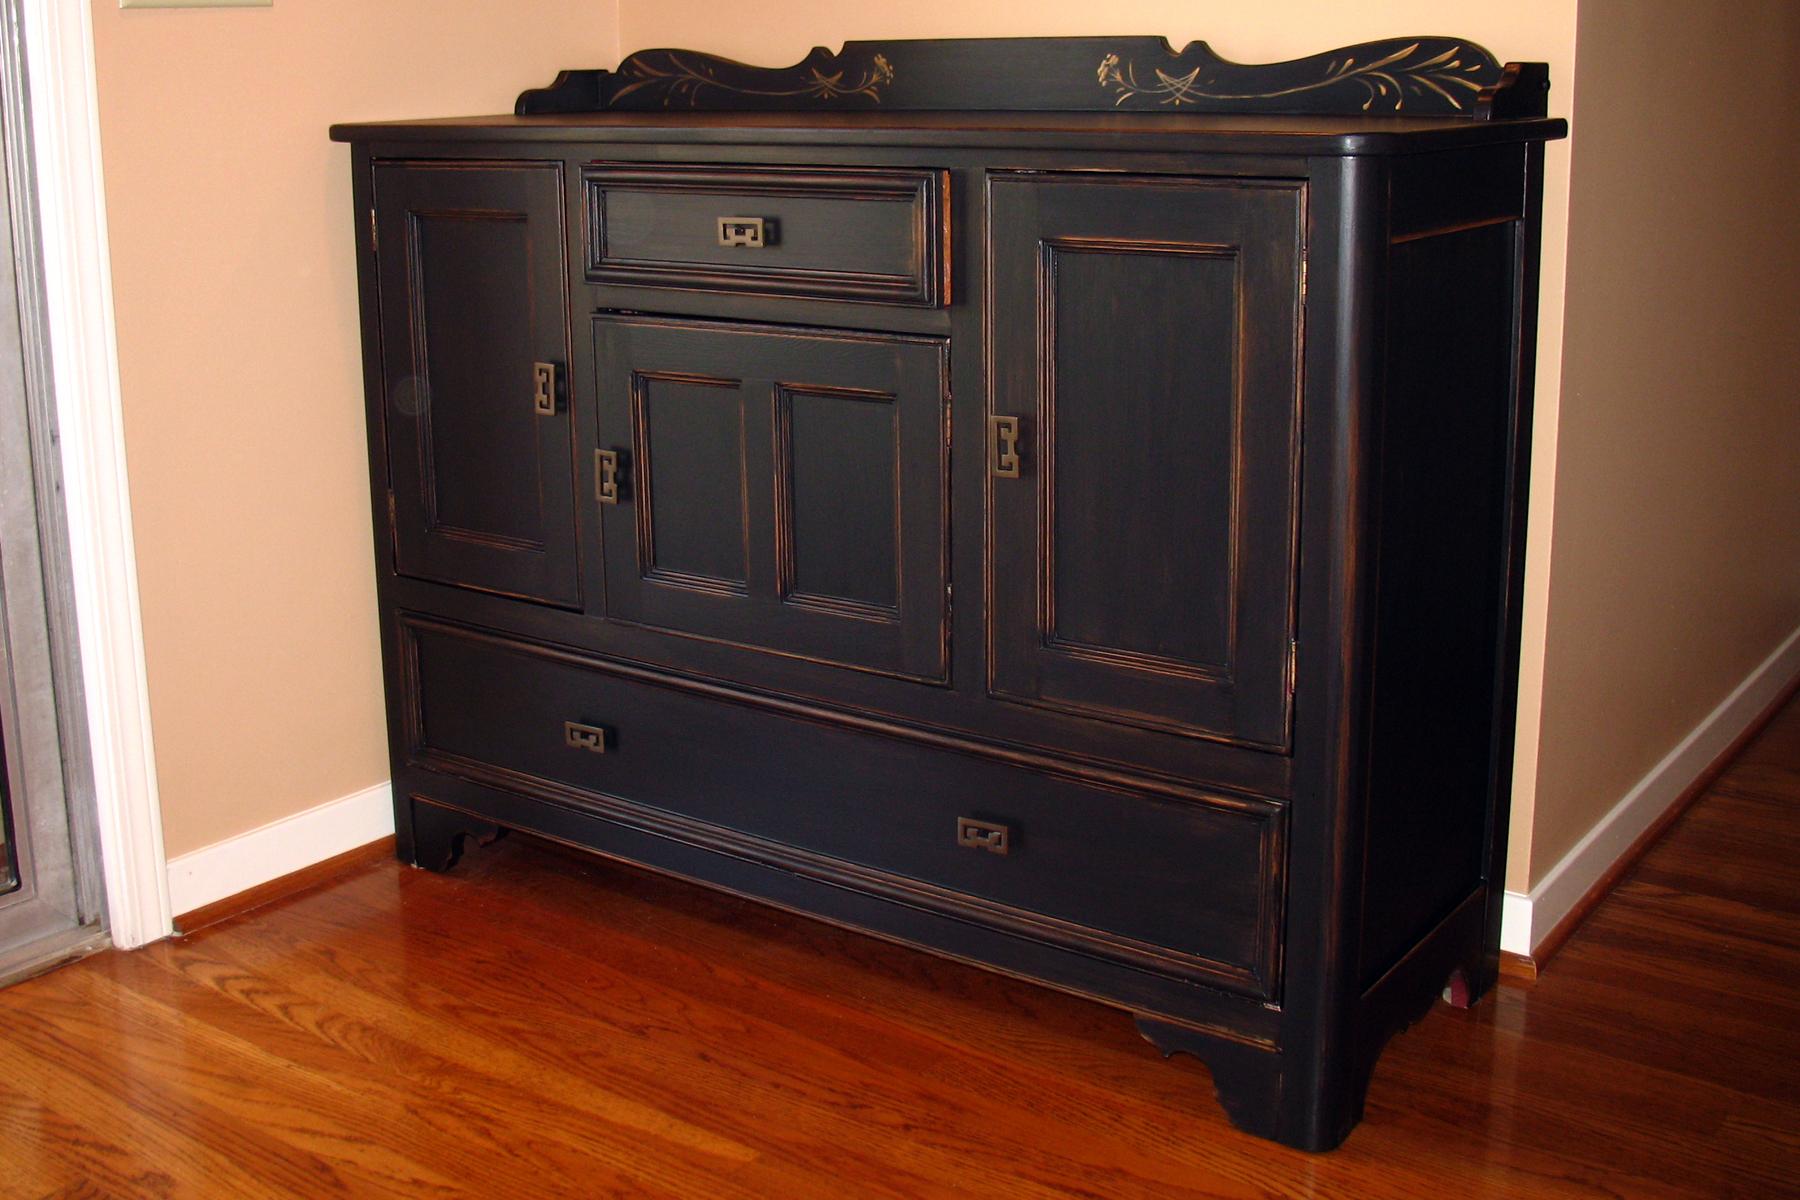 cabinet-antique-black.jpg